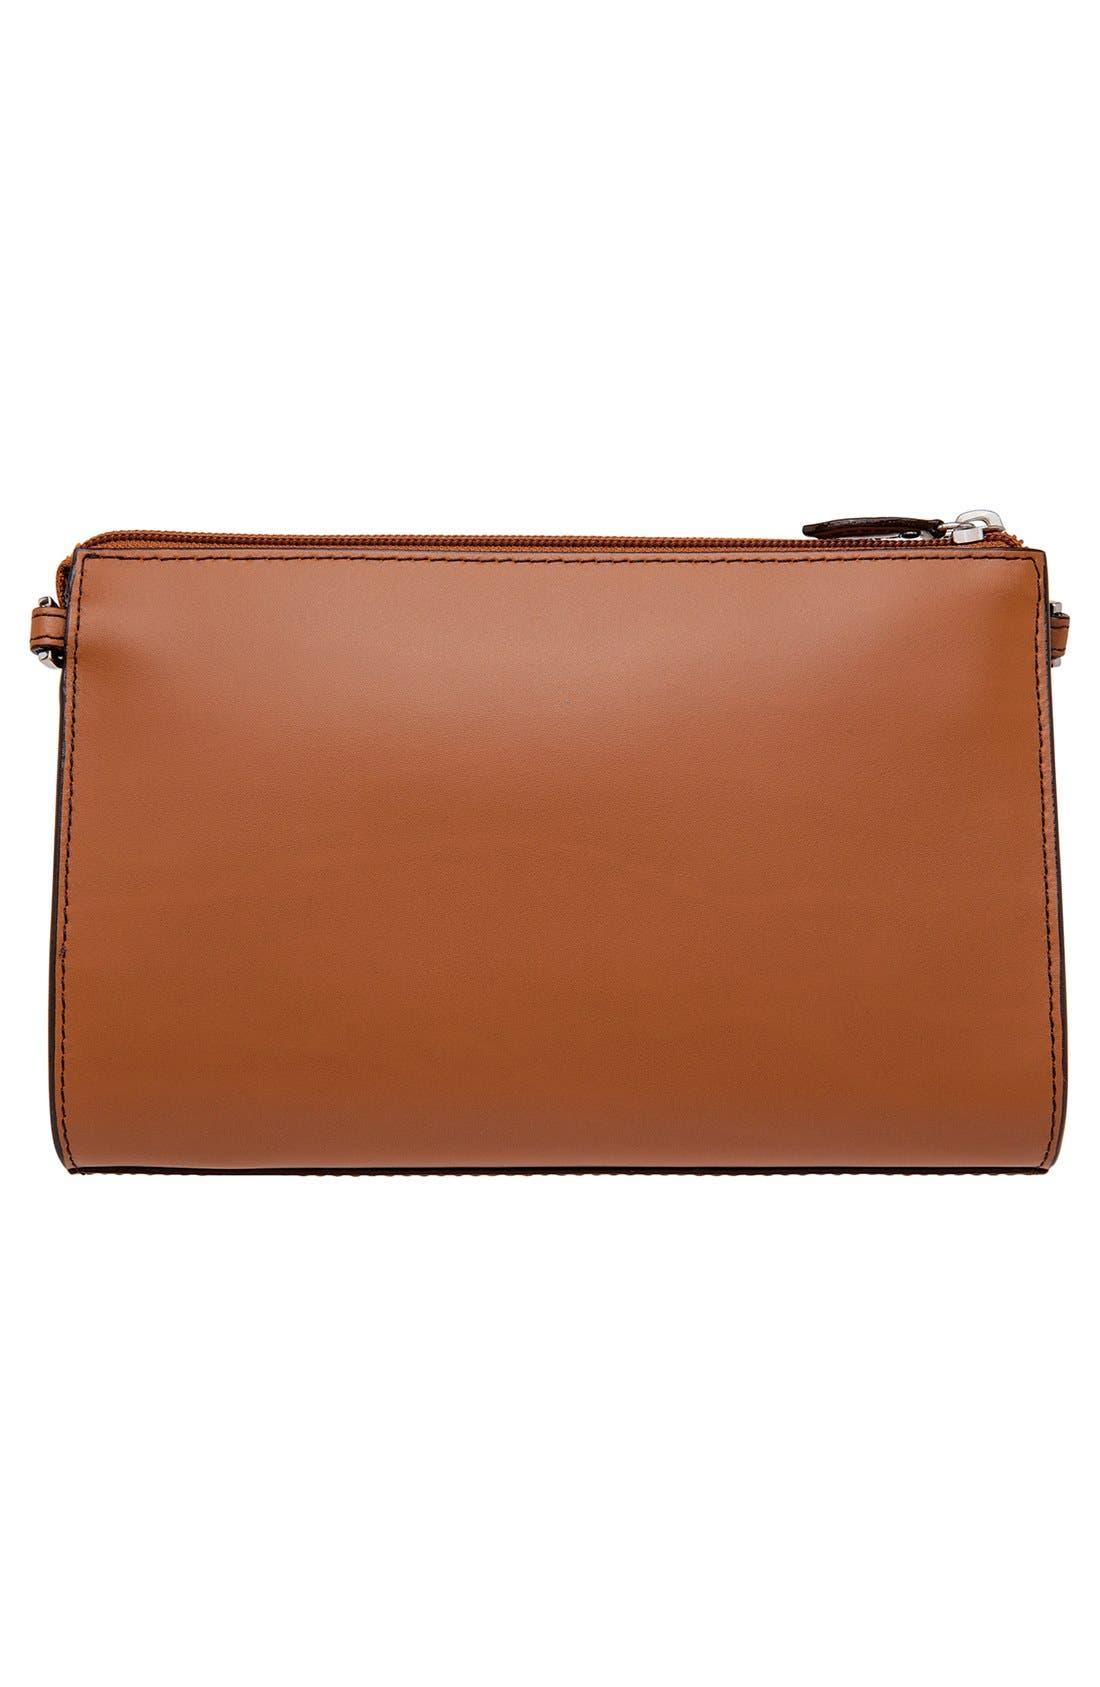 Lodis'Audrey Collection -Vicky' ConvertibleCrossbody Bag,                             Alternate thumbnail 26, color,